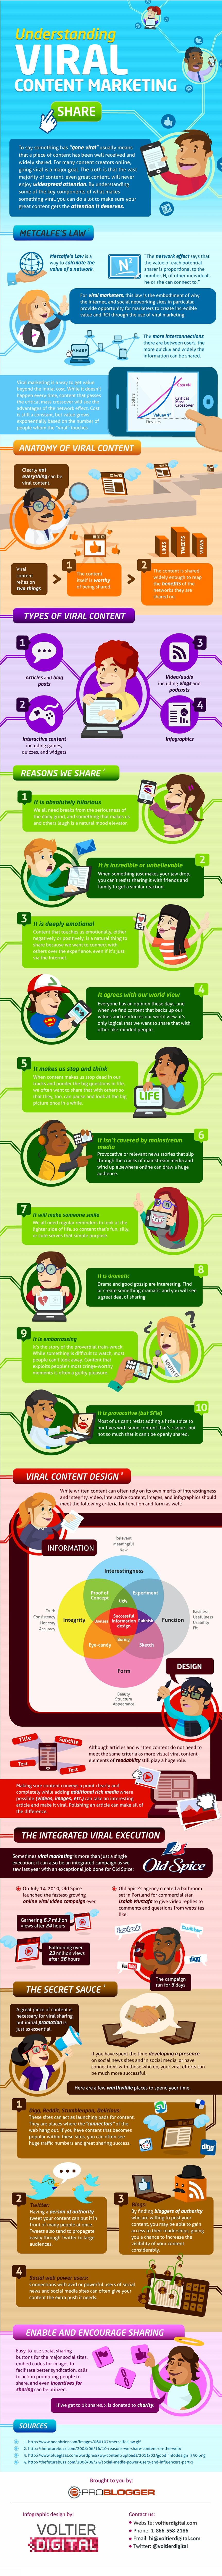 Understanding-Viral-Content-Marketing-infographic